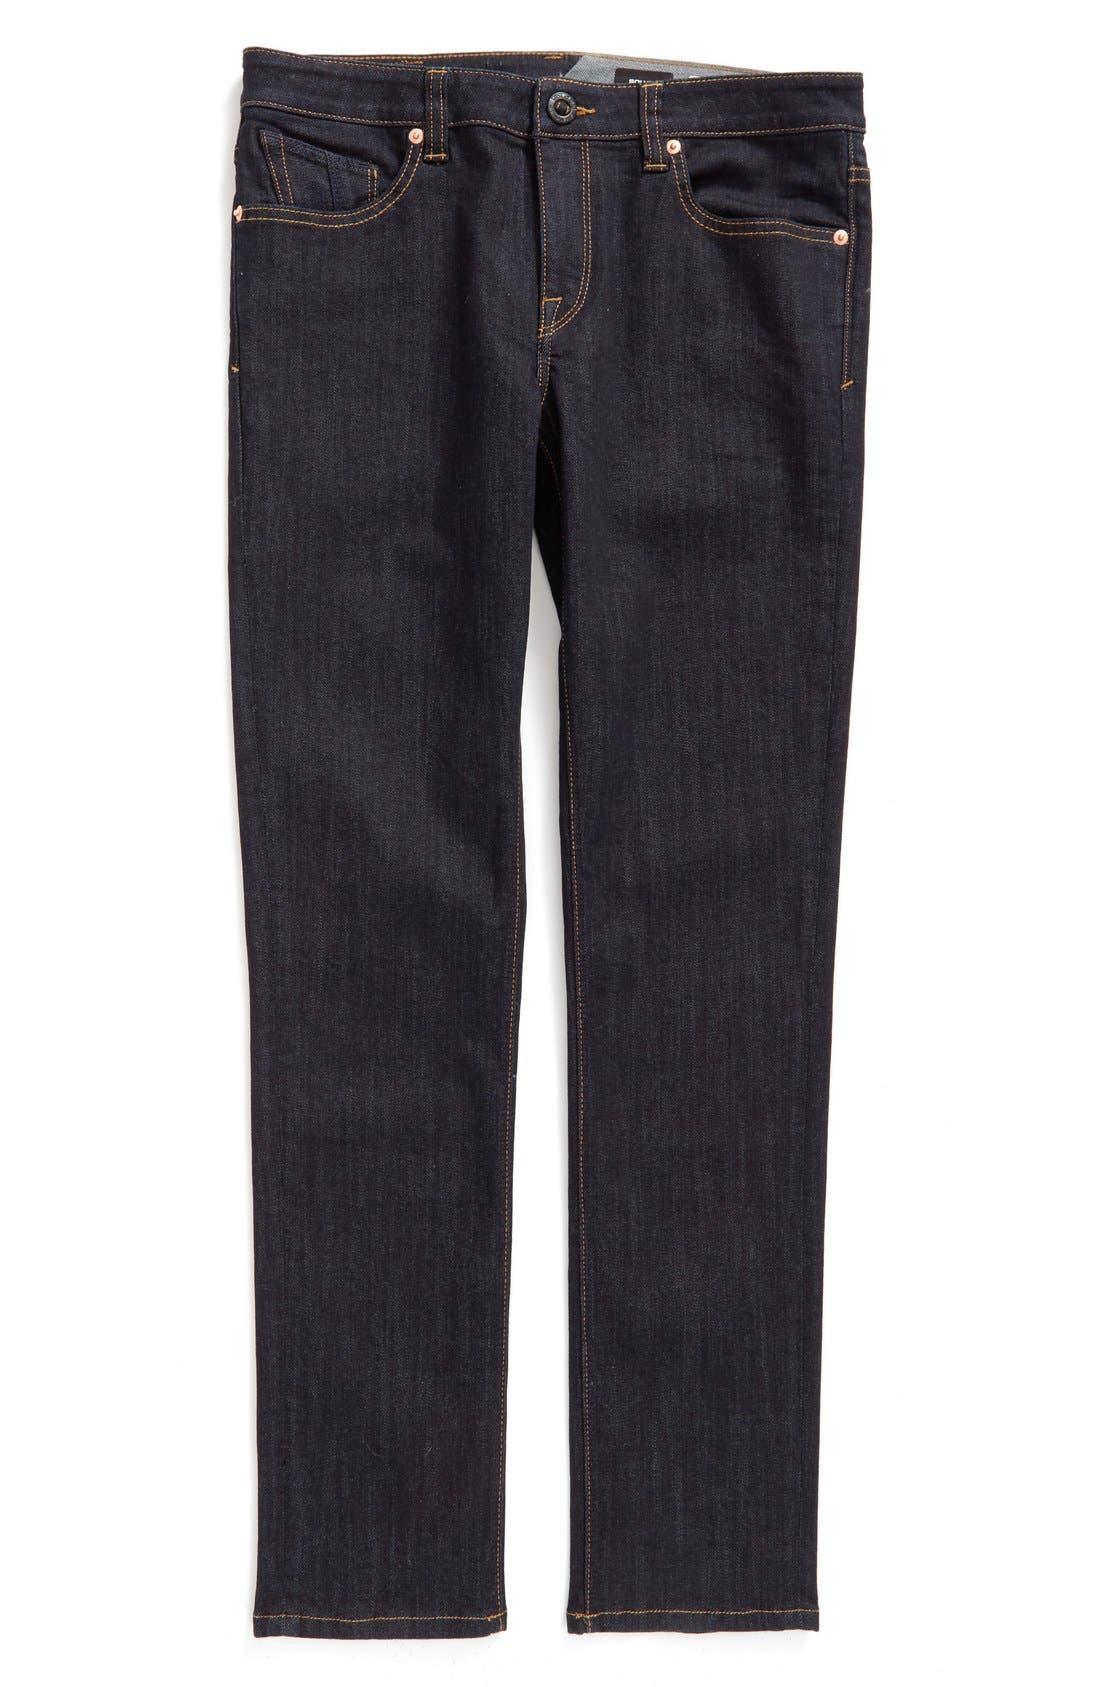 VOLCOM, 'Solver' Straight Leg Denim Jeans, Main thumbnail 1, color, BLUE RINSE